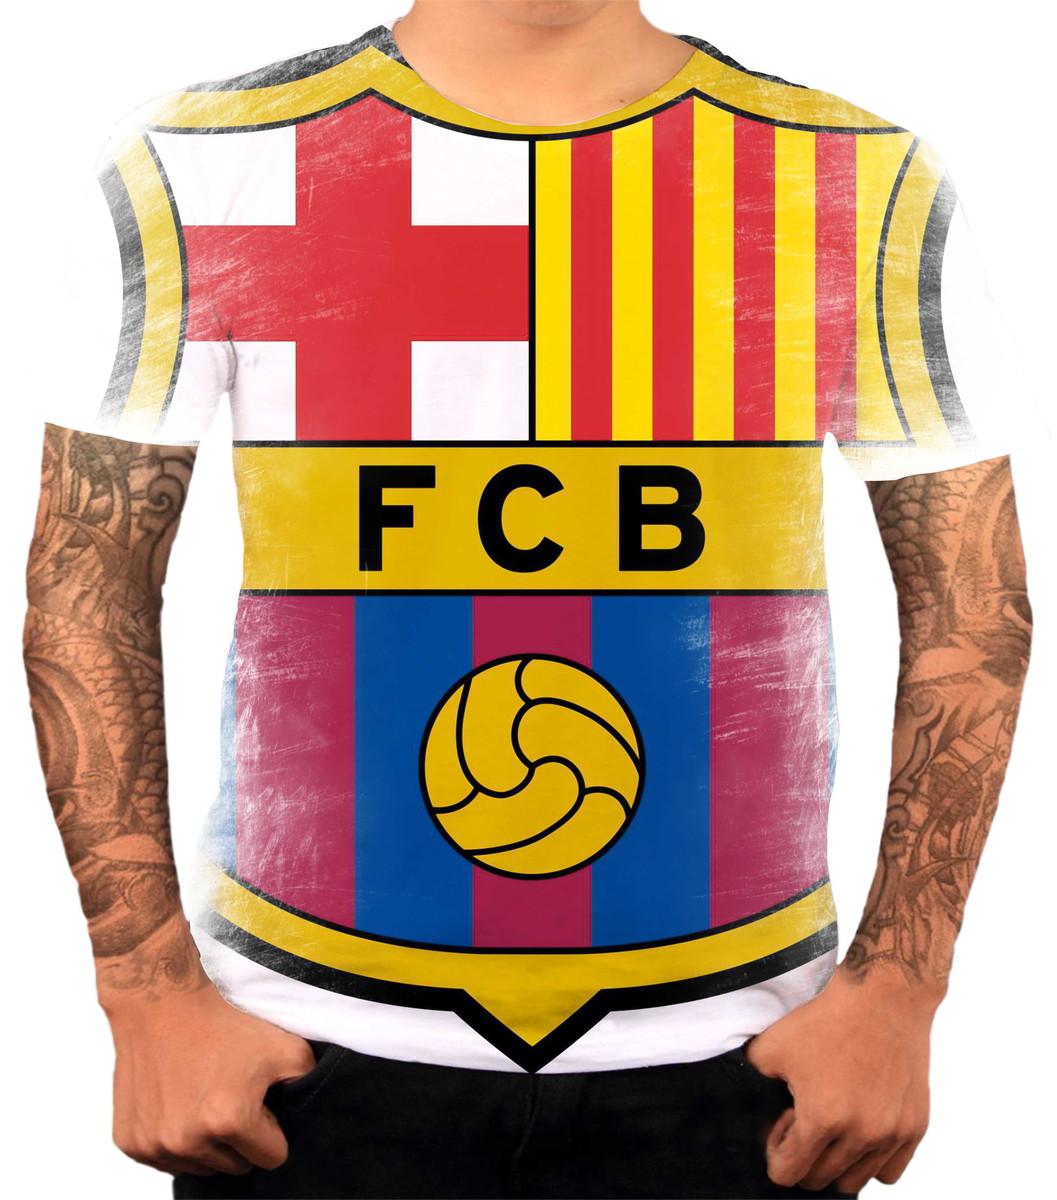 Camisa Camiseta Personalizada Time De Futebol Barcelona 02 no Elo7 ... d96cd708186d6